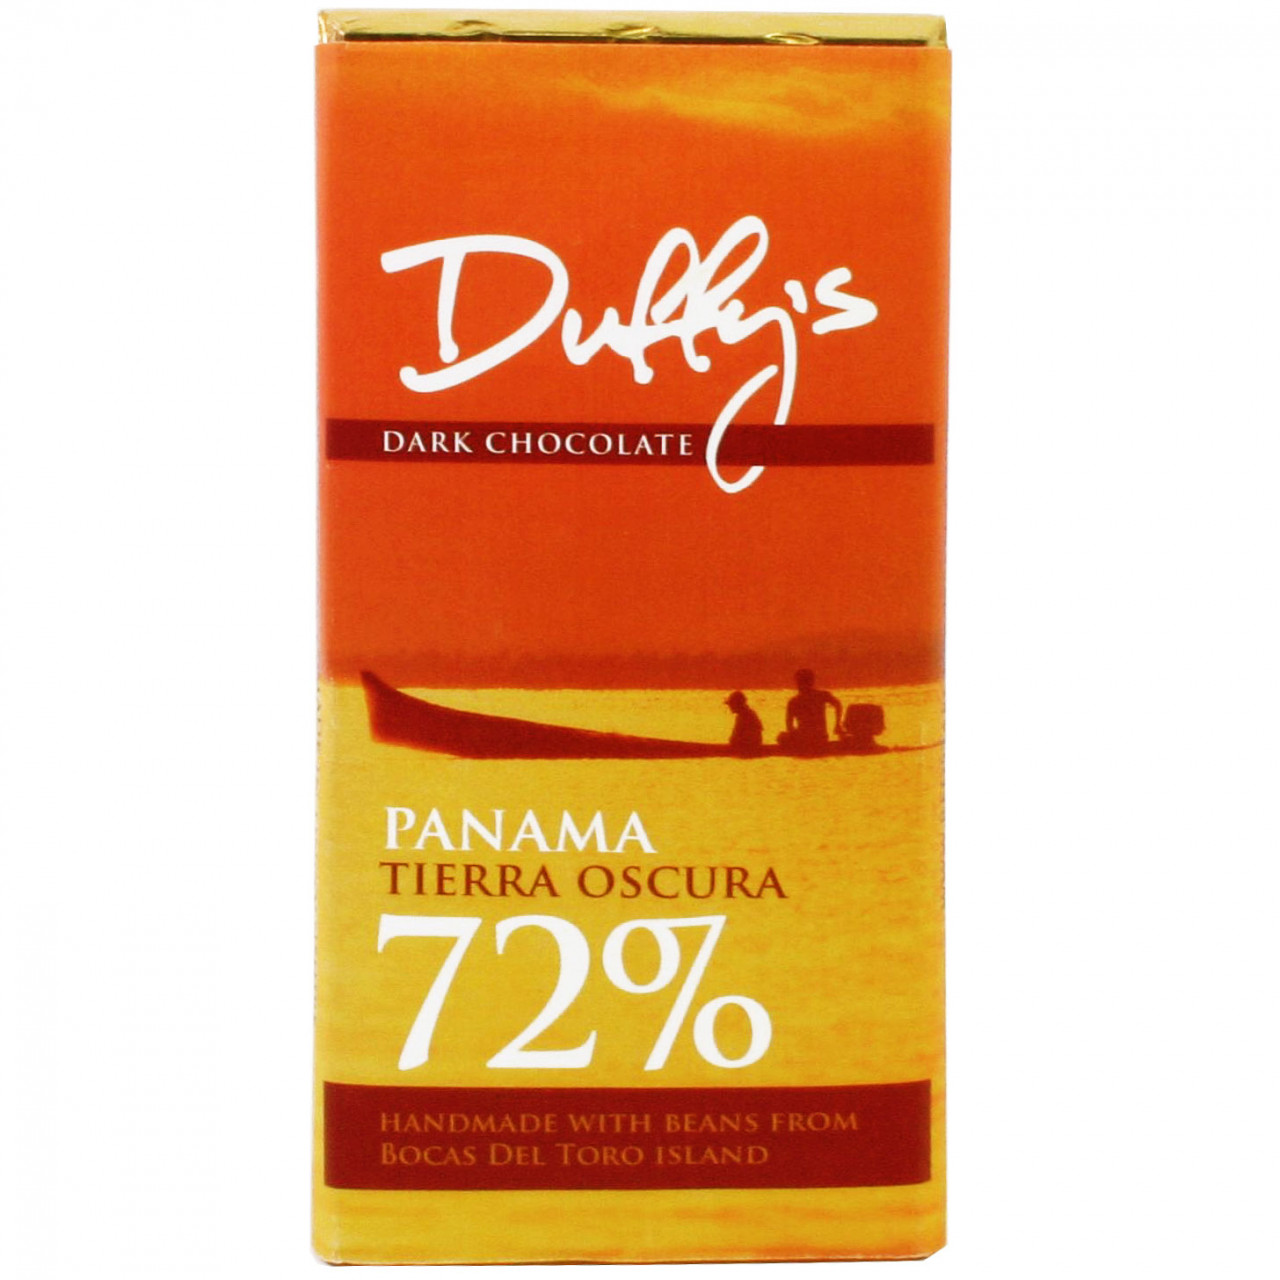 Panama Tierra Oscura 72% dunkle Schokolade von Duffy's Chocolatedunkle Schokolade, Zartbitterschokolade, Schokolade aus Pananma, sojafrei, glutenfrei, dark chocolate, chocolat noir, Panama, Duffys,